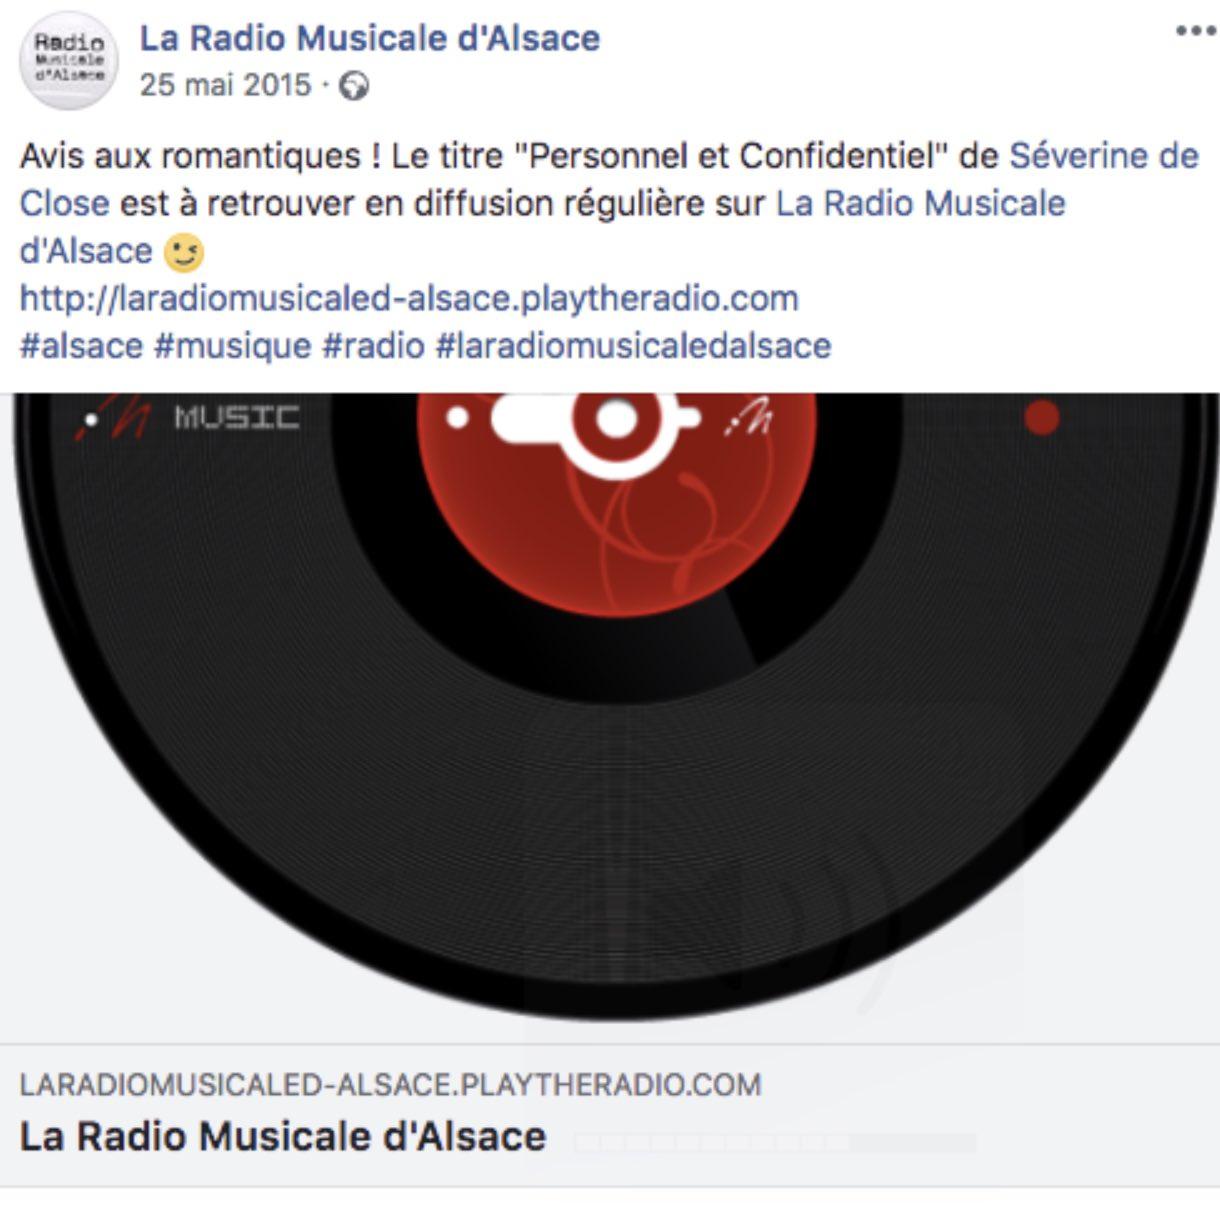 La Radio Musiciale D'Alsace - 25/05/15